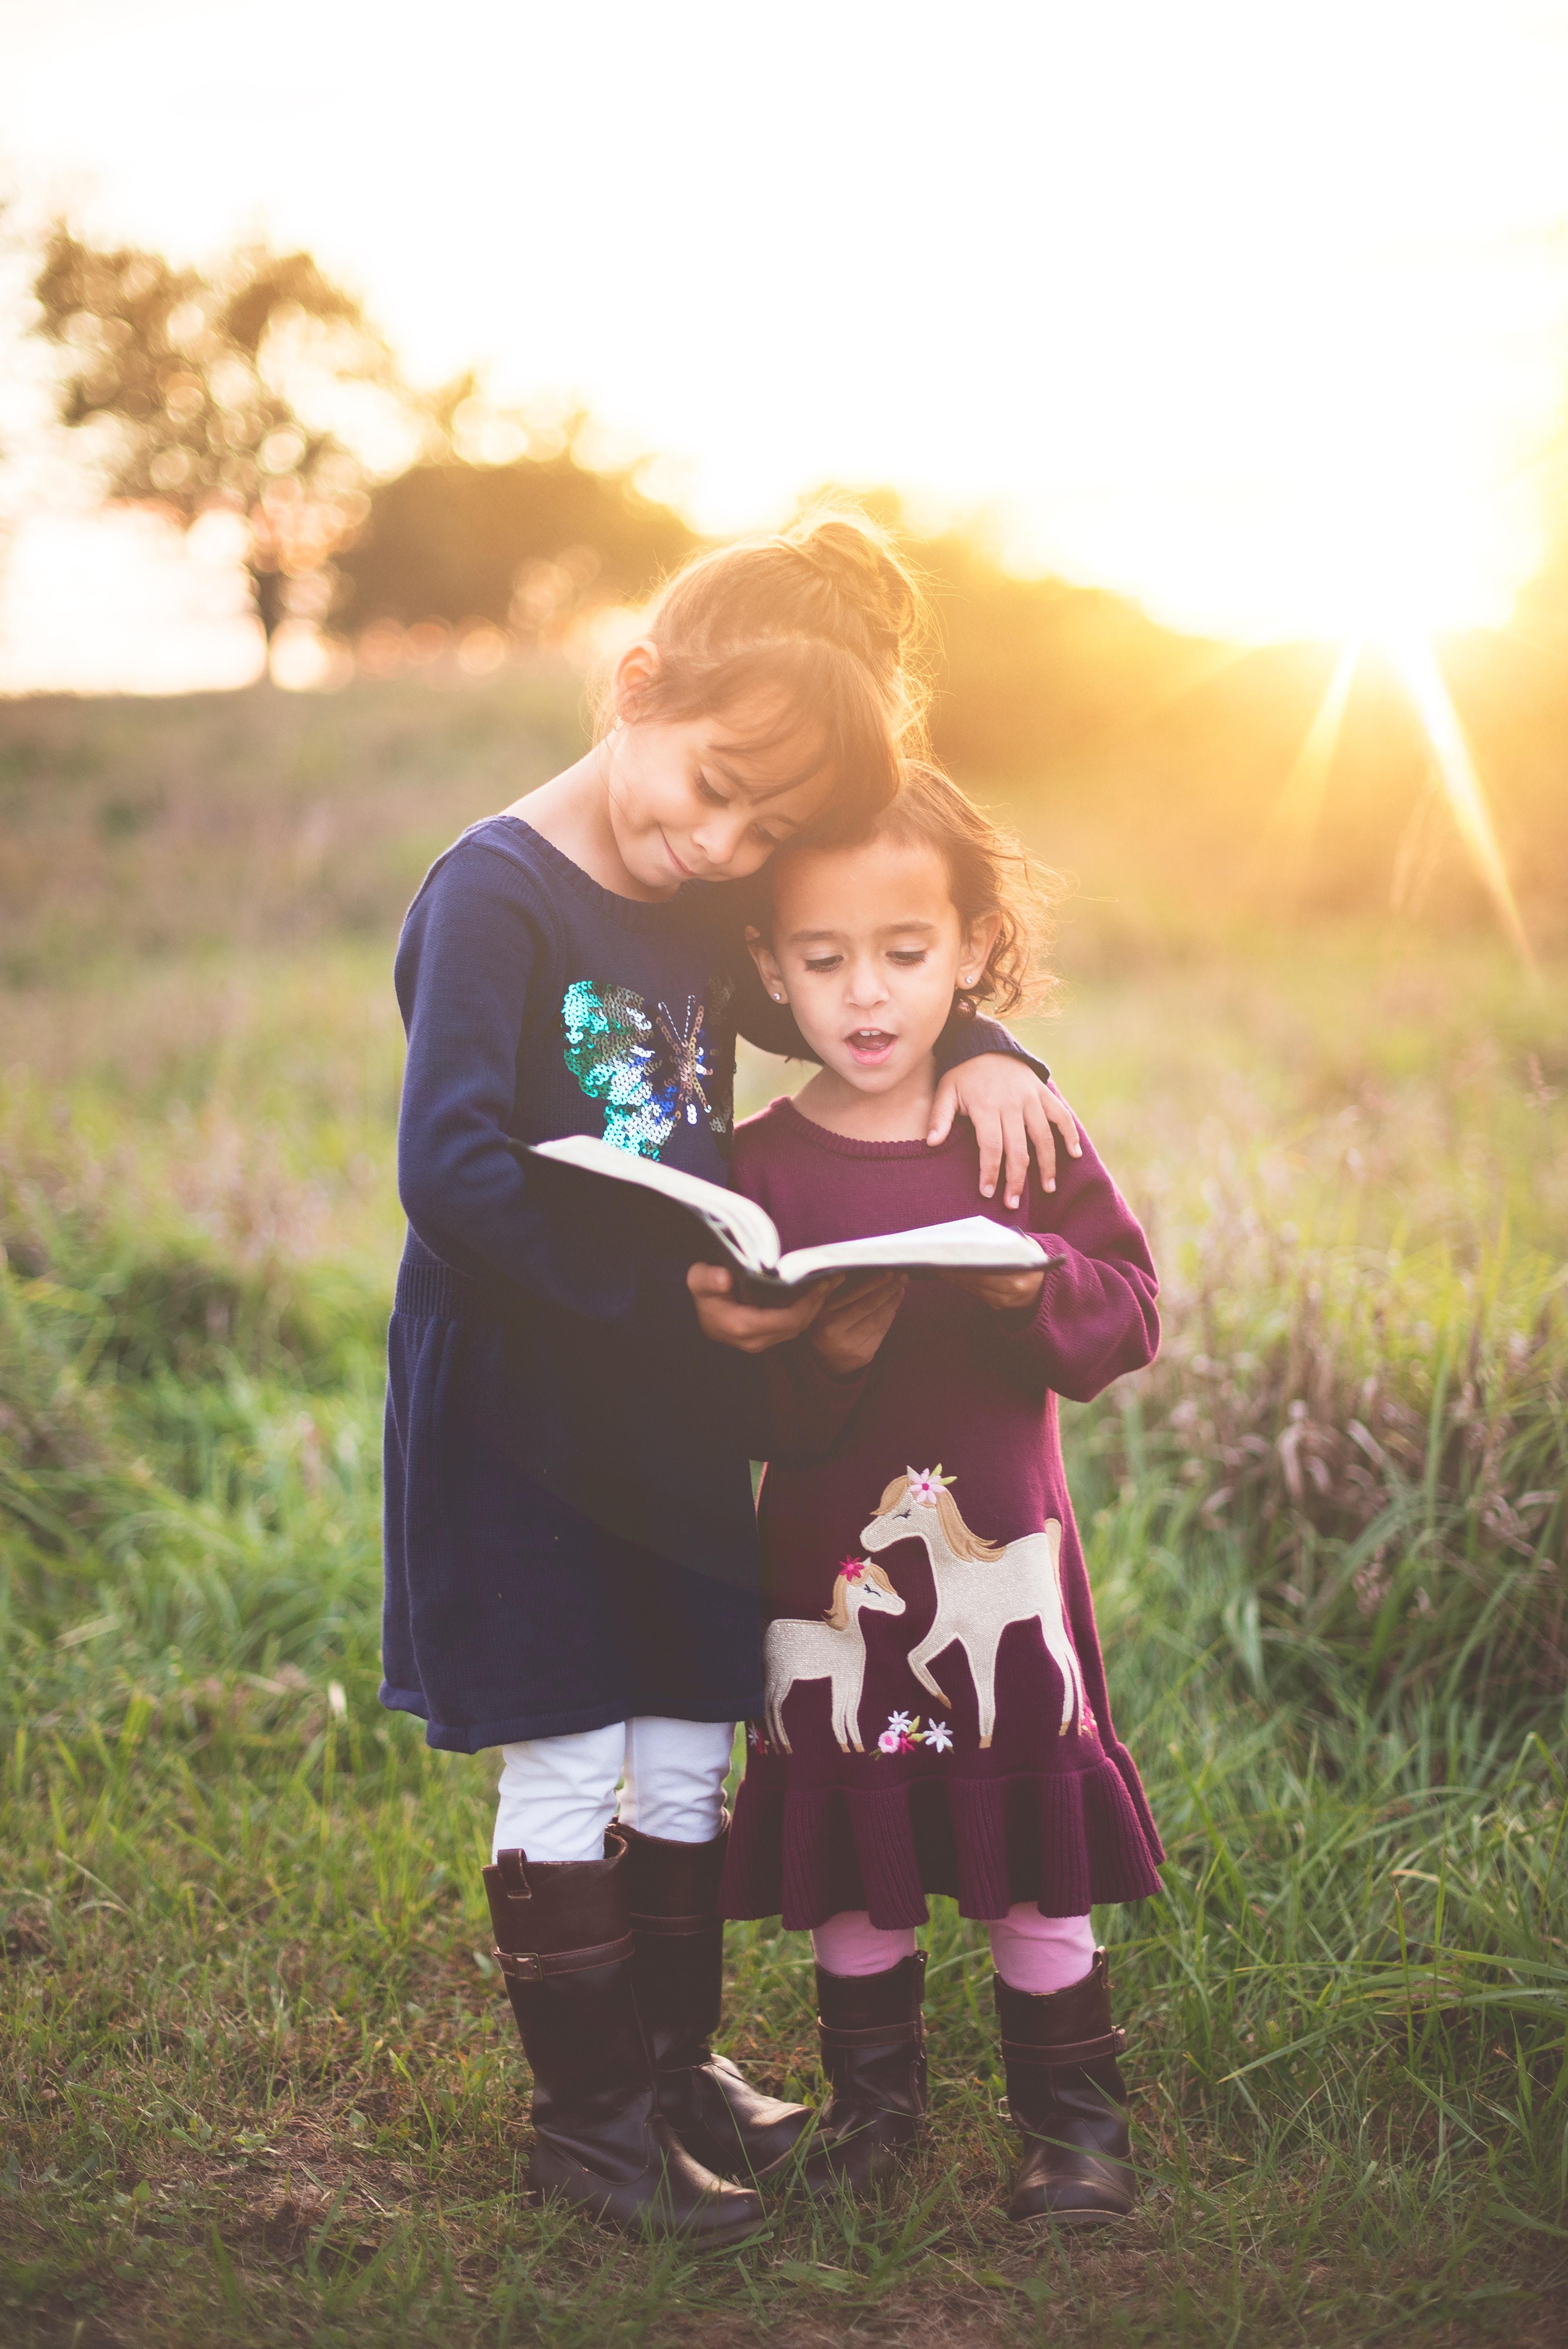 Keep Those School Skills Sharp - Family Reading